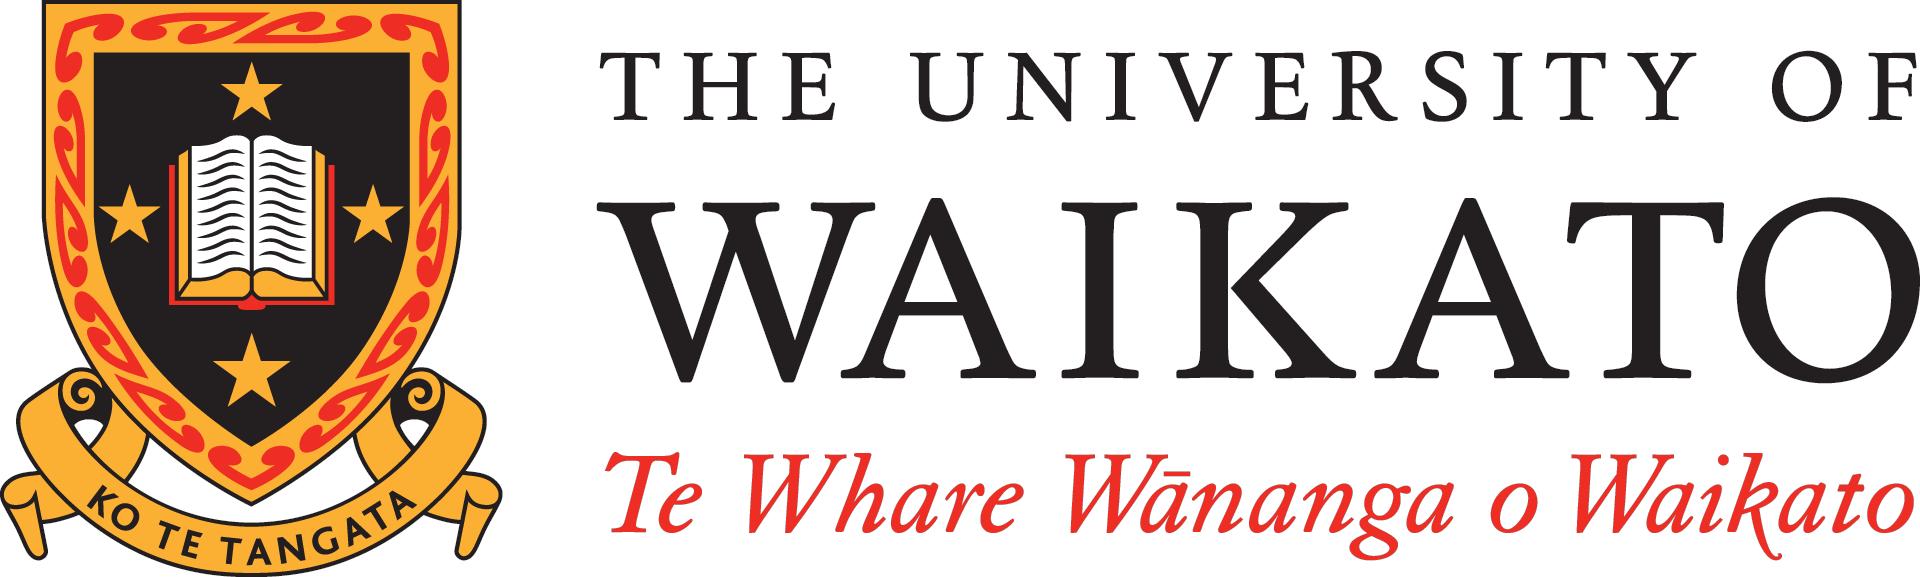 UoW logo colour